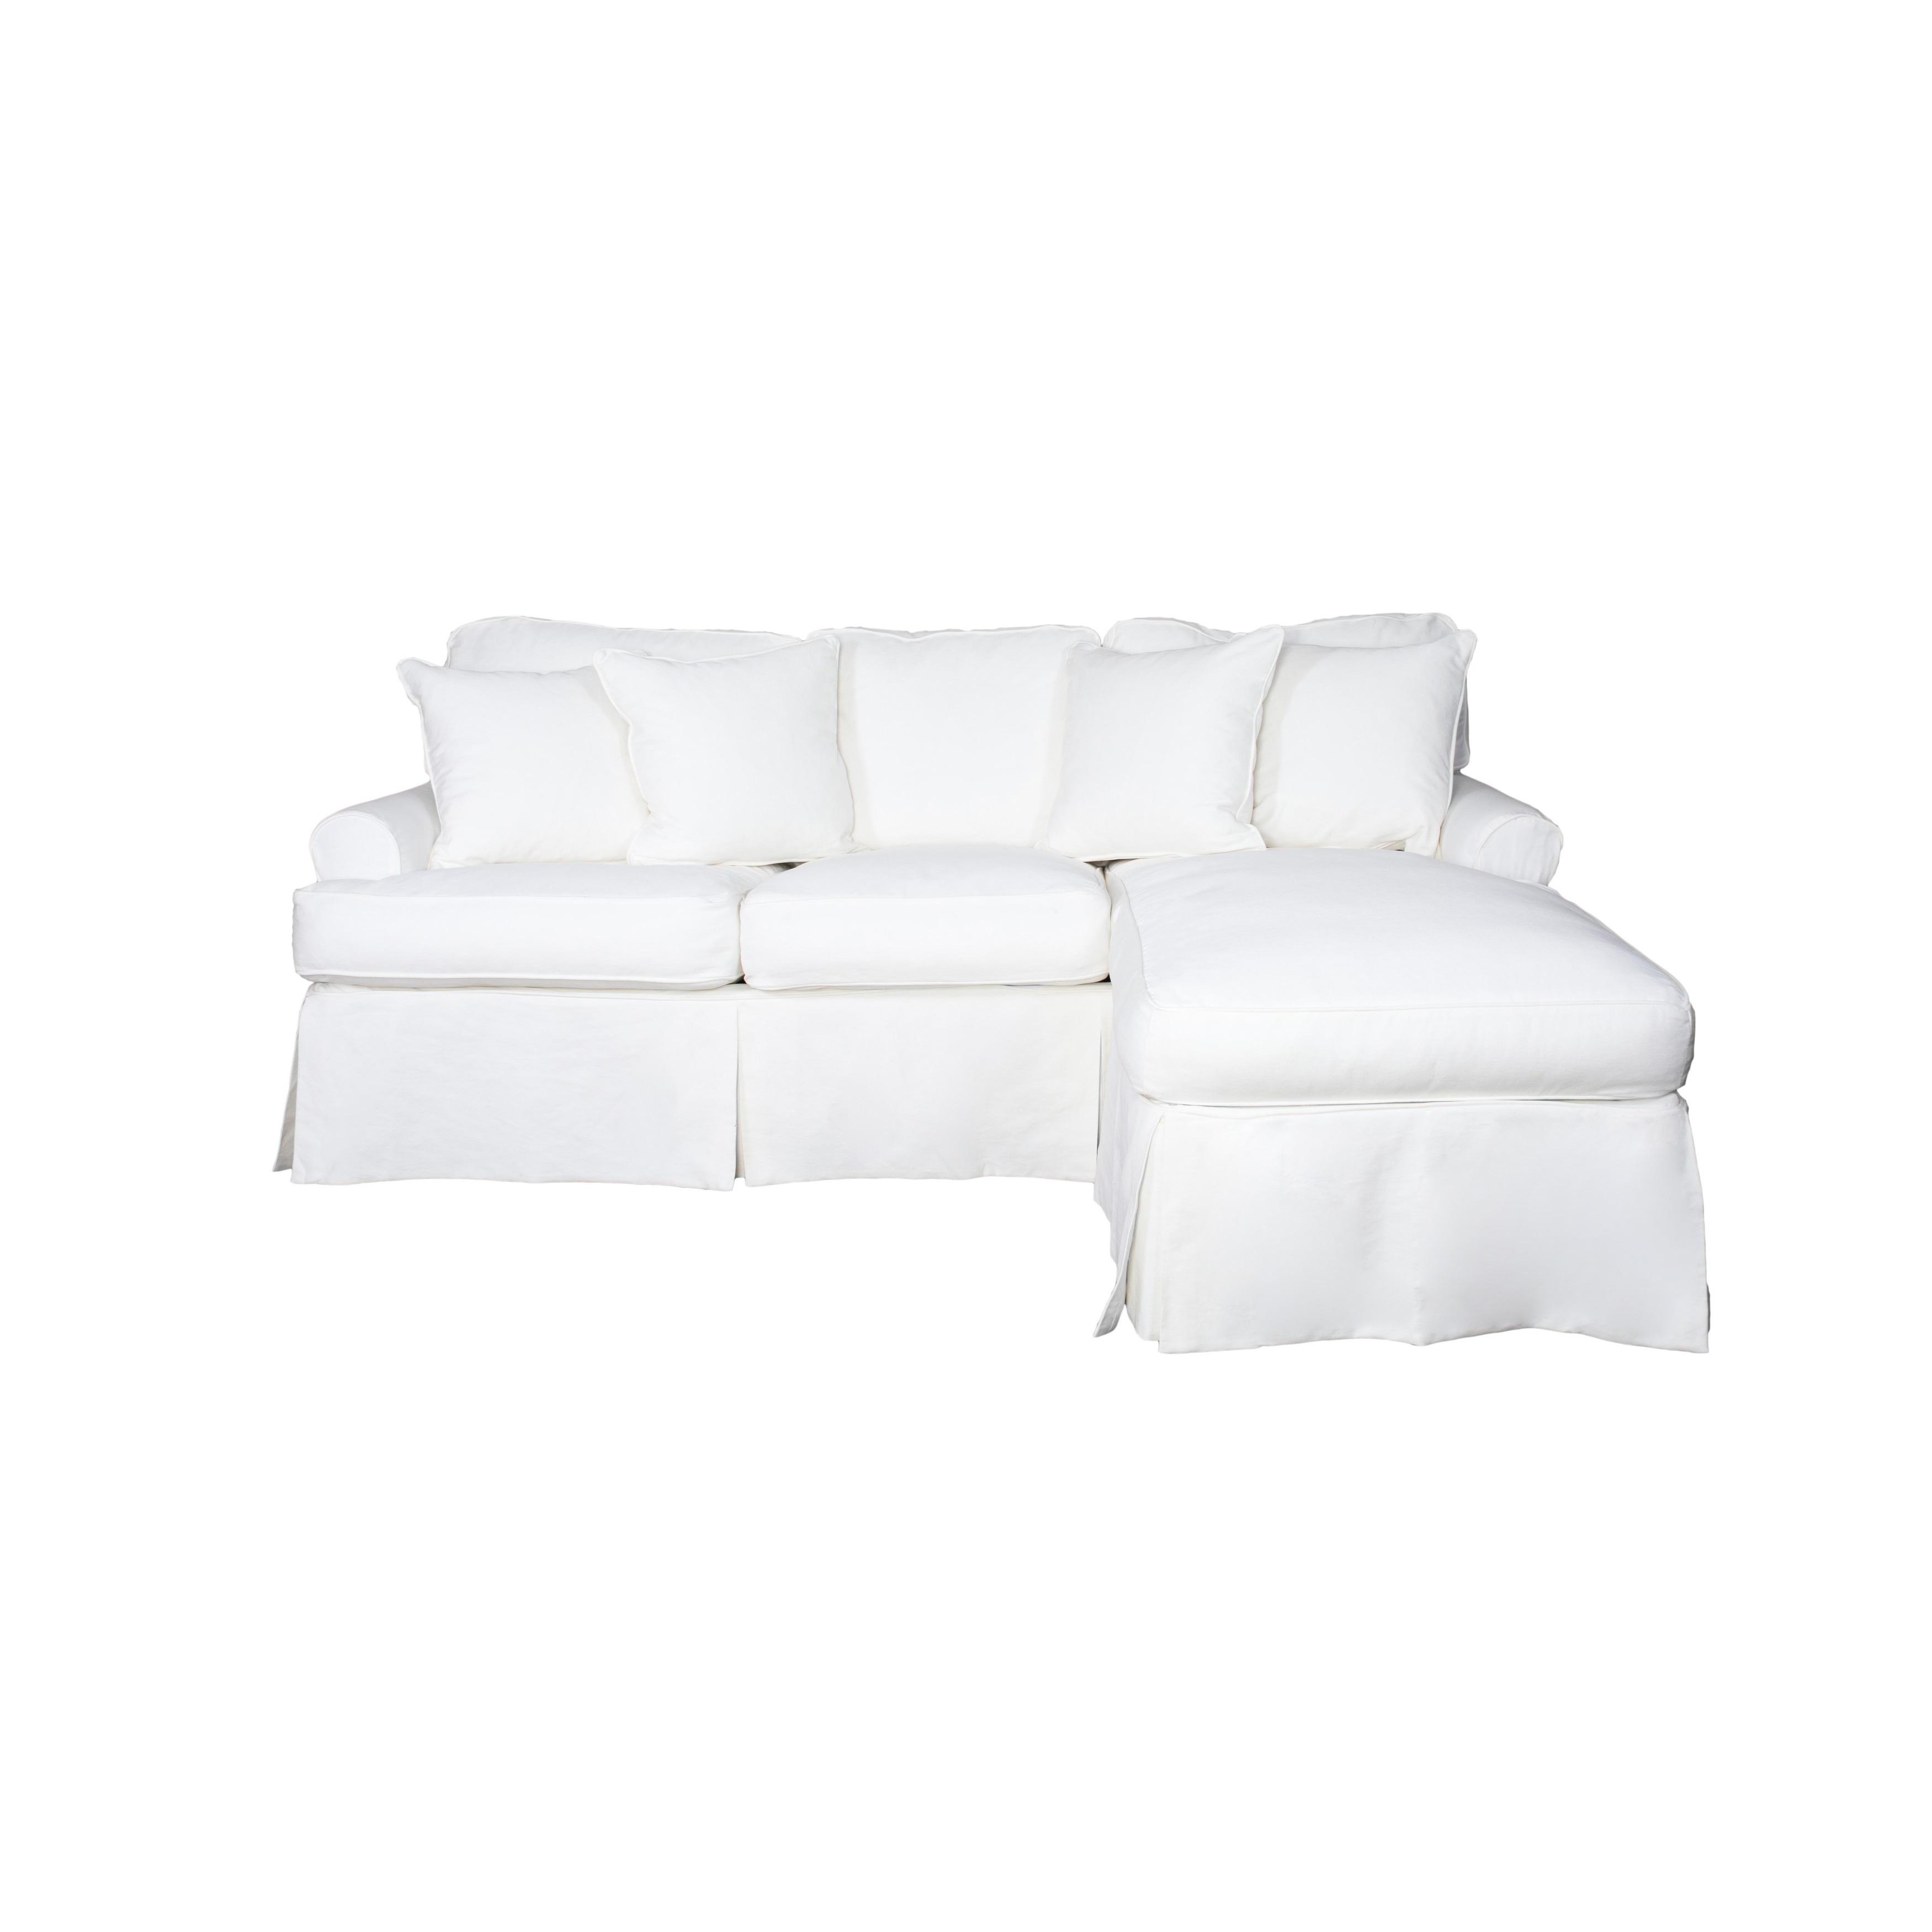 Sunset Trading Horizon Sectional Sofa Slipcover - White (Cover Only)